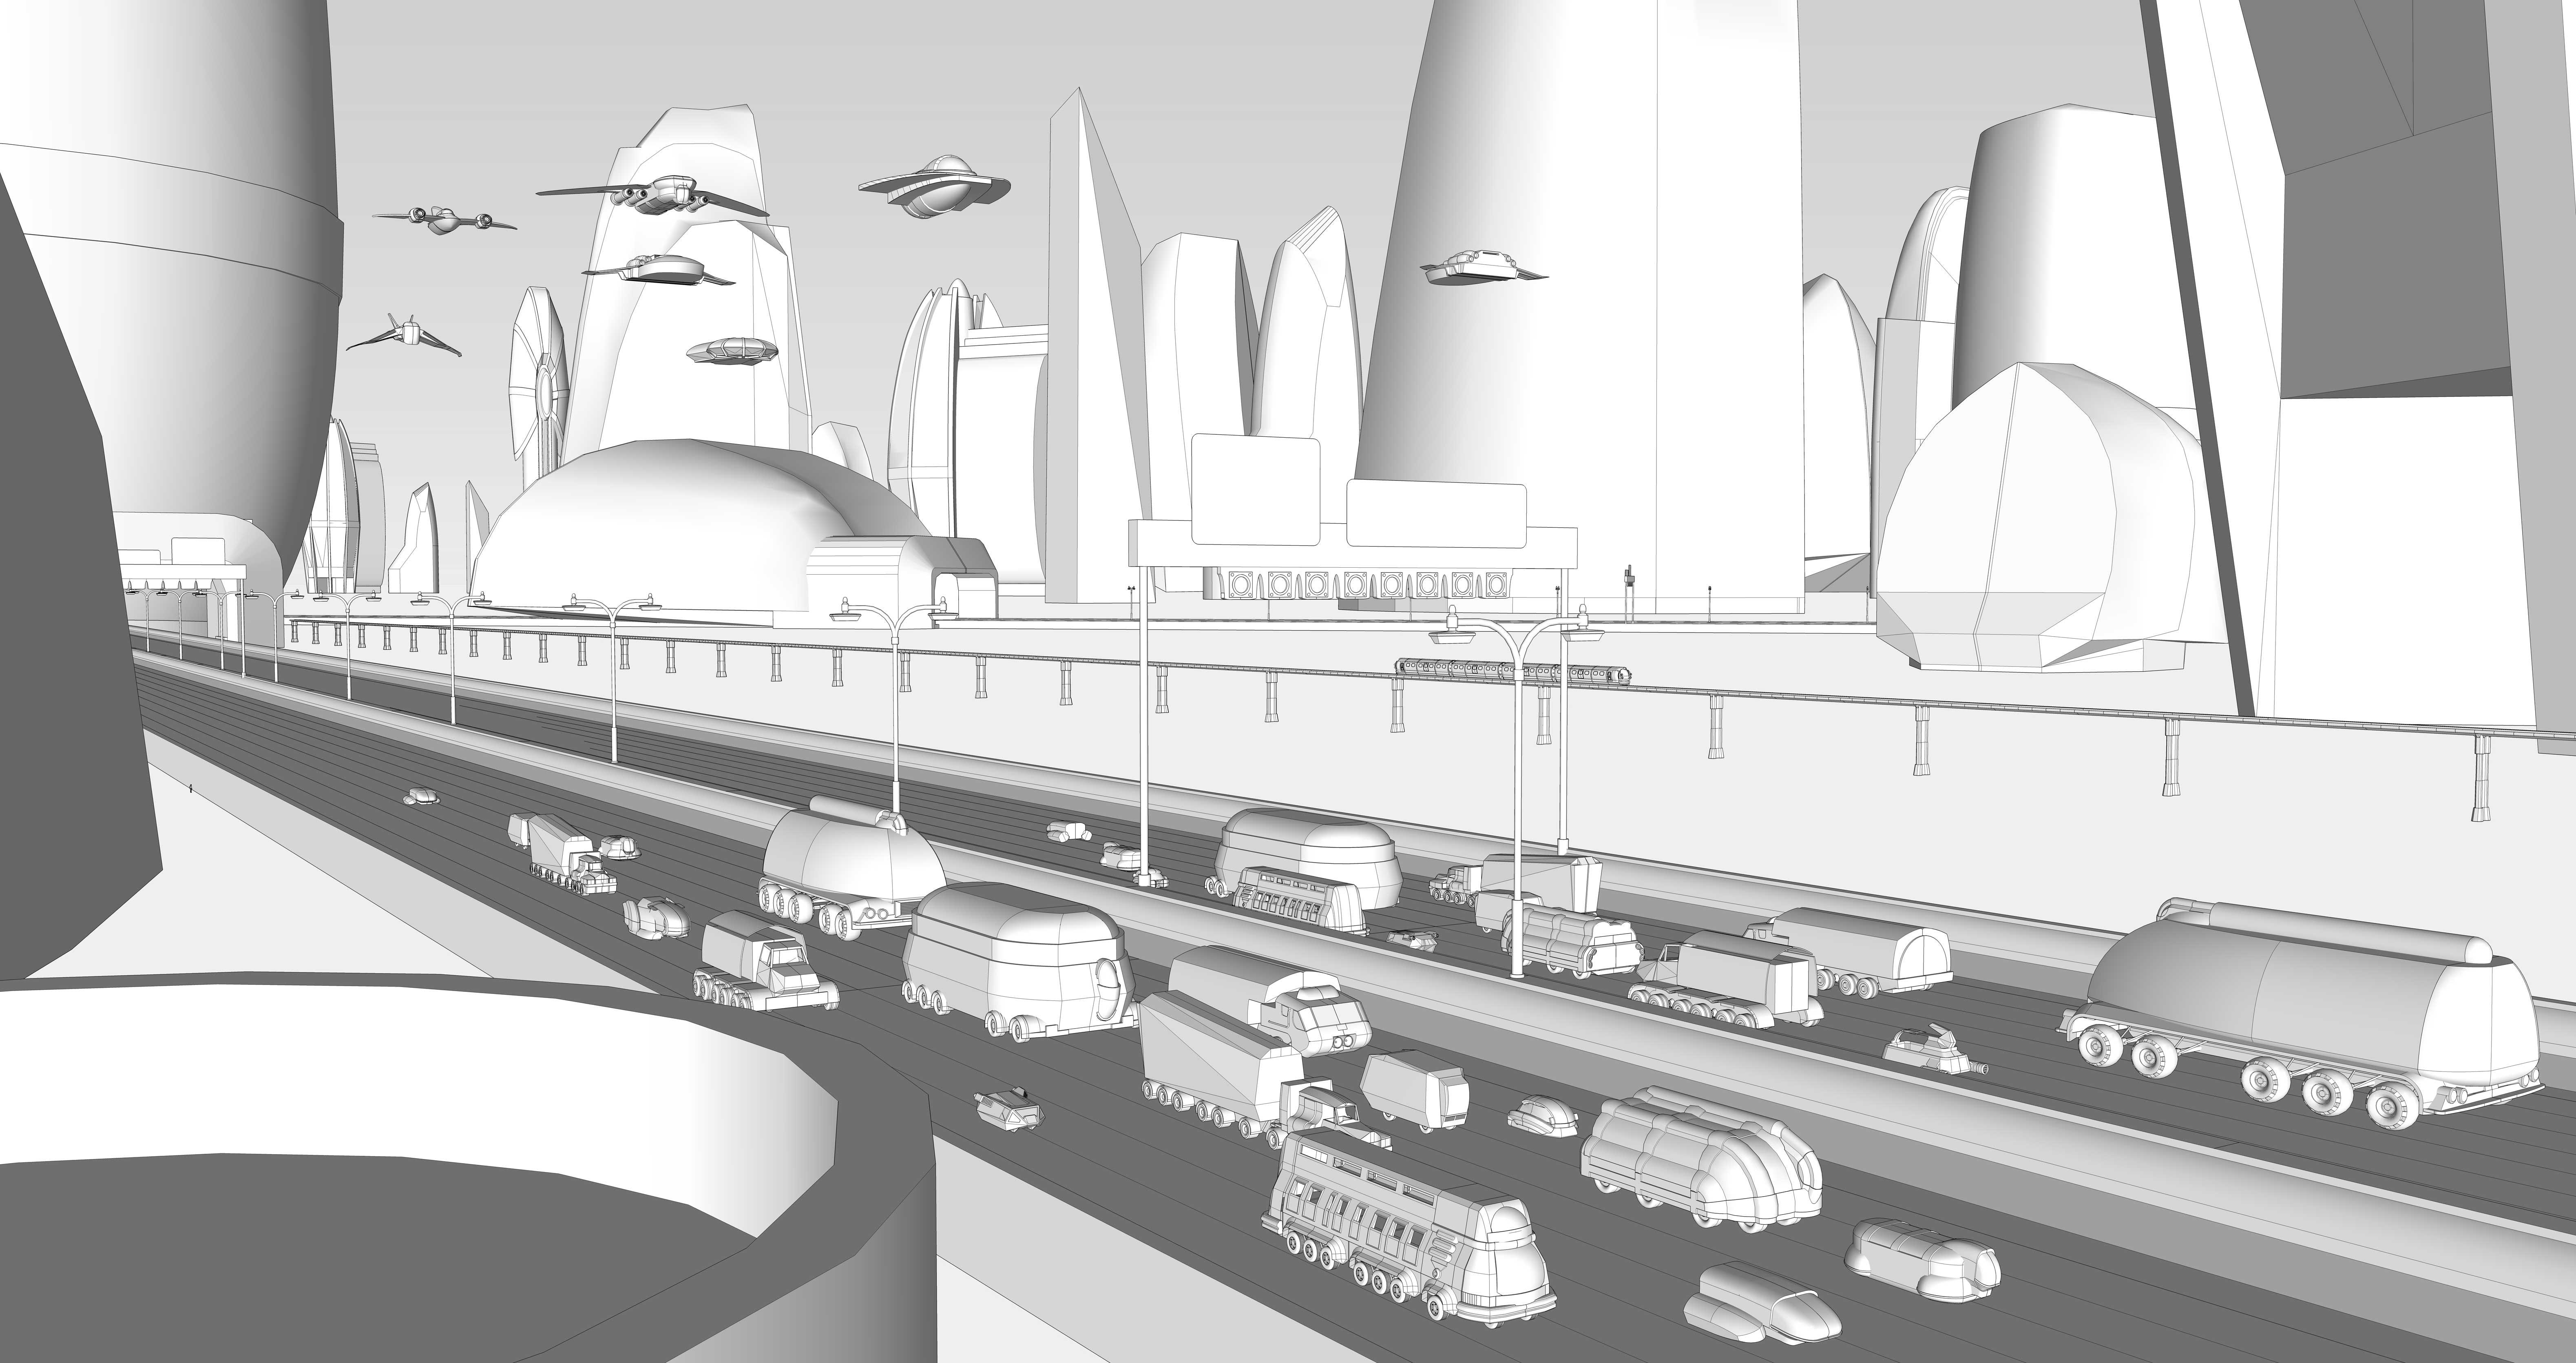 SketchUp Mega Mega City One by KevLev